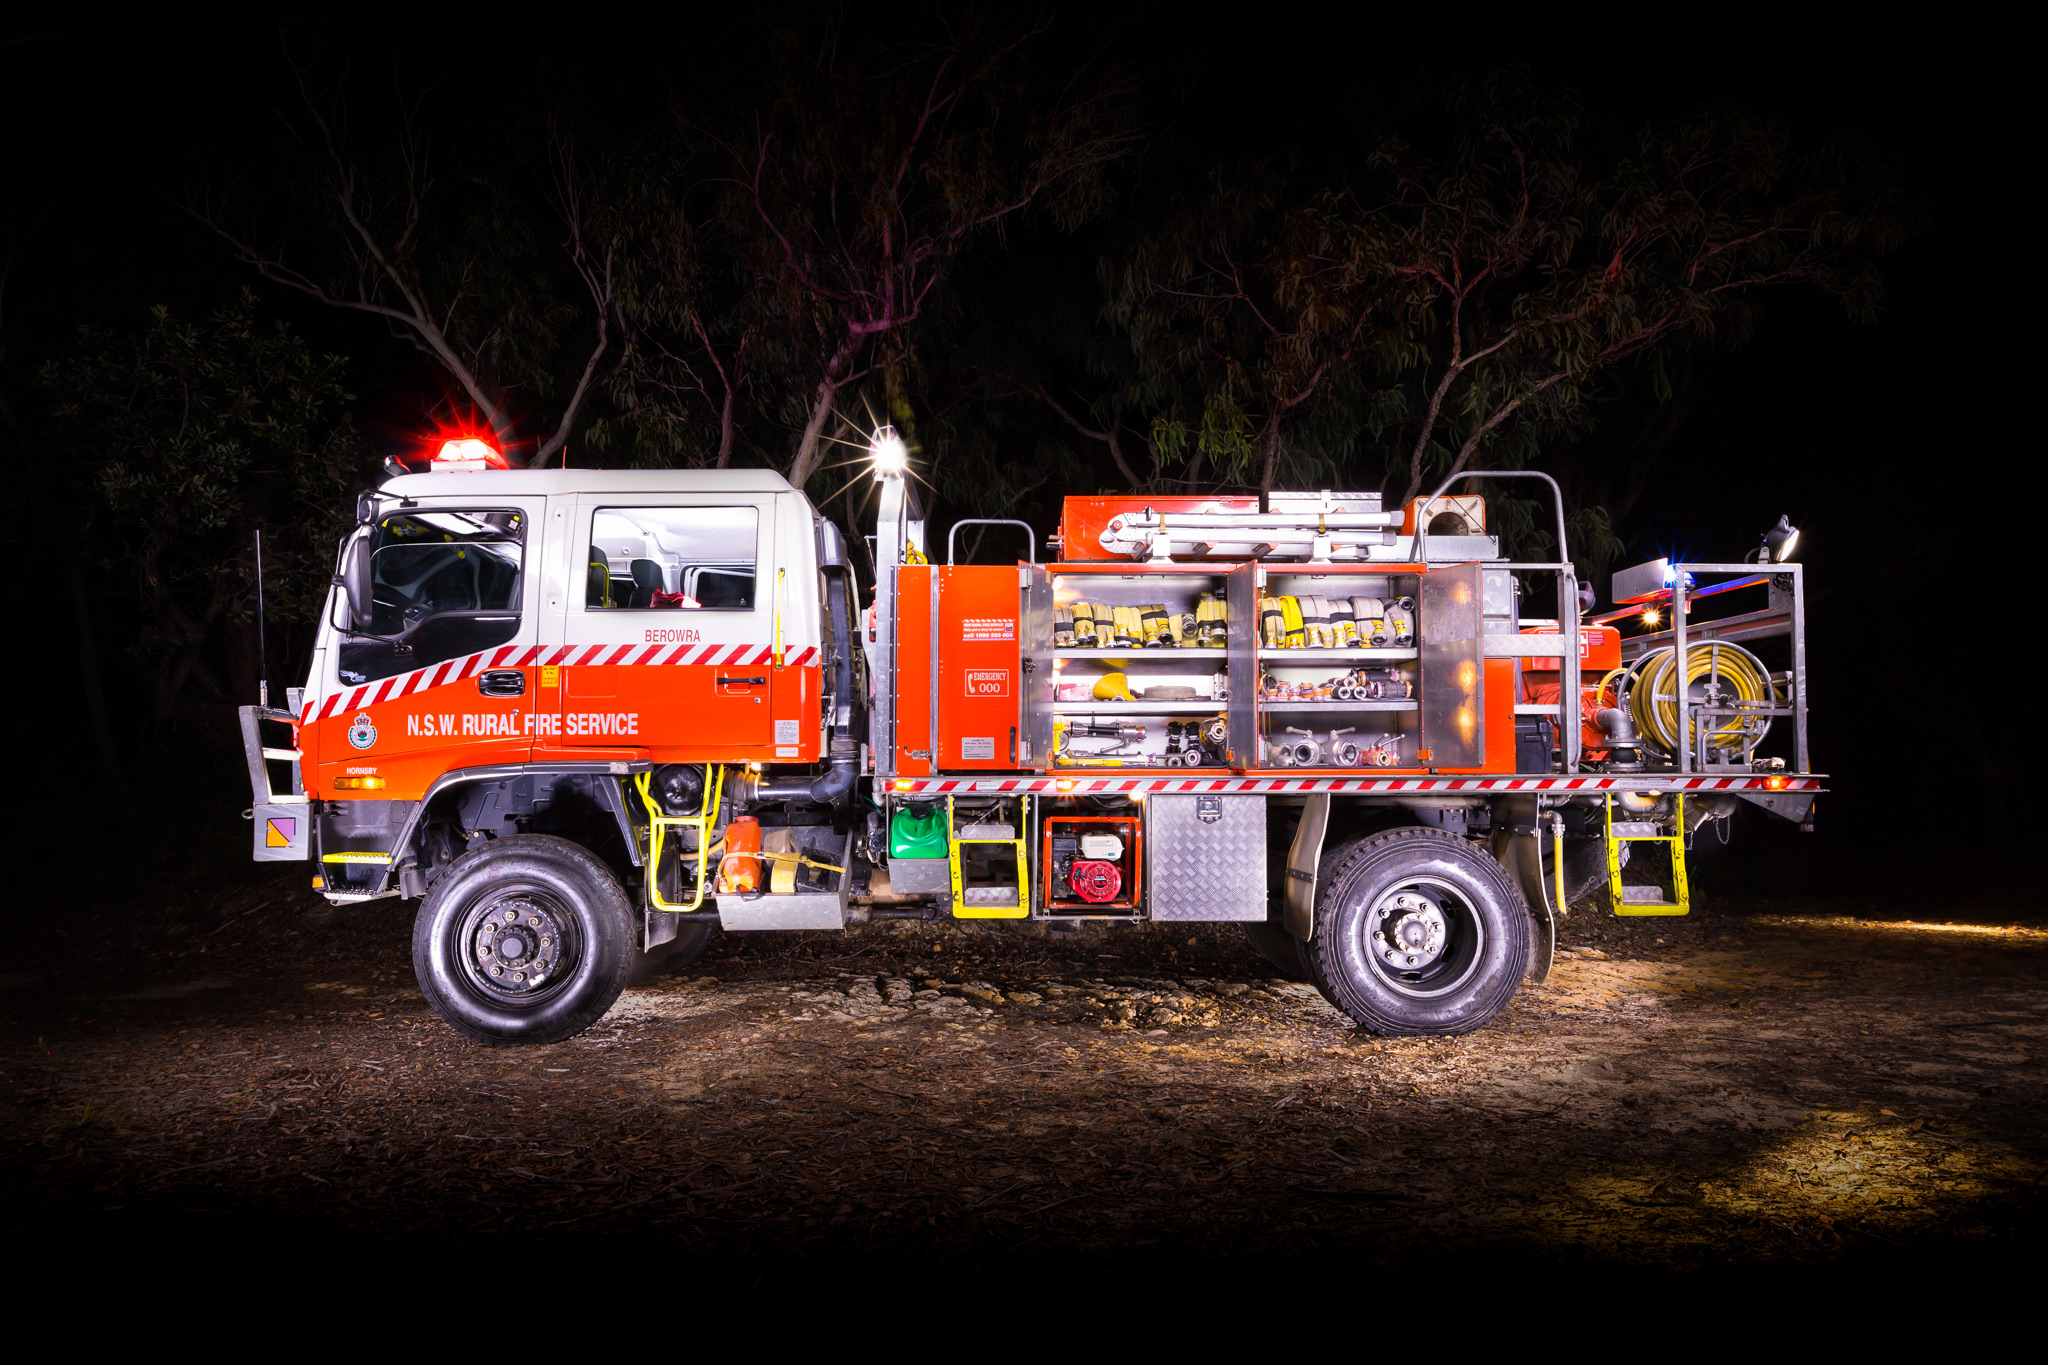 Berowra RFS Tanker - Emergency Service Vehicle Photography